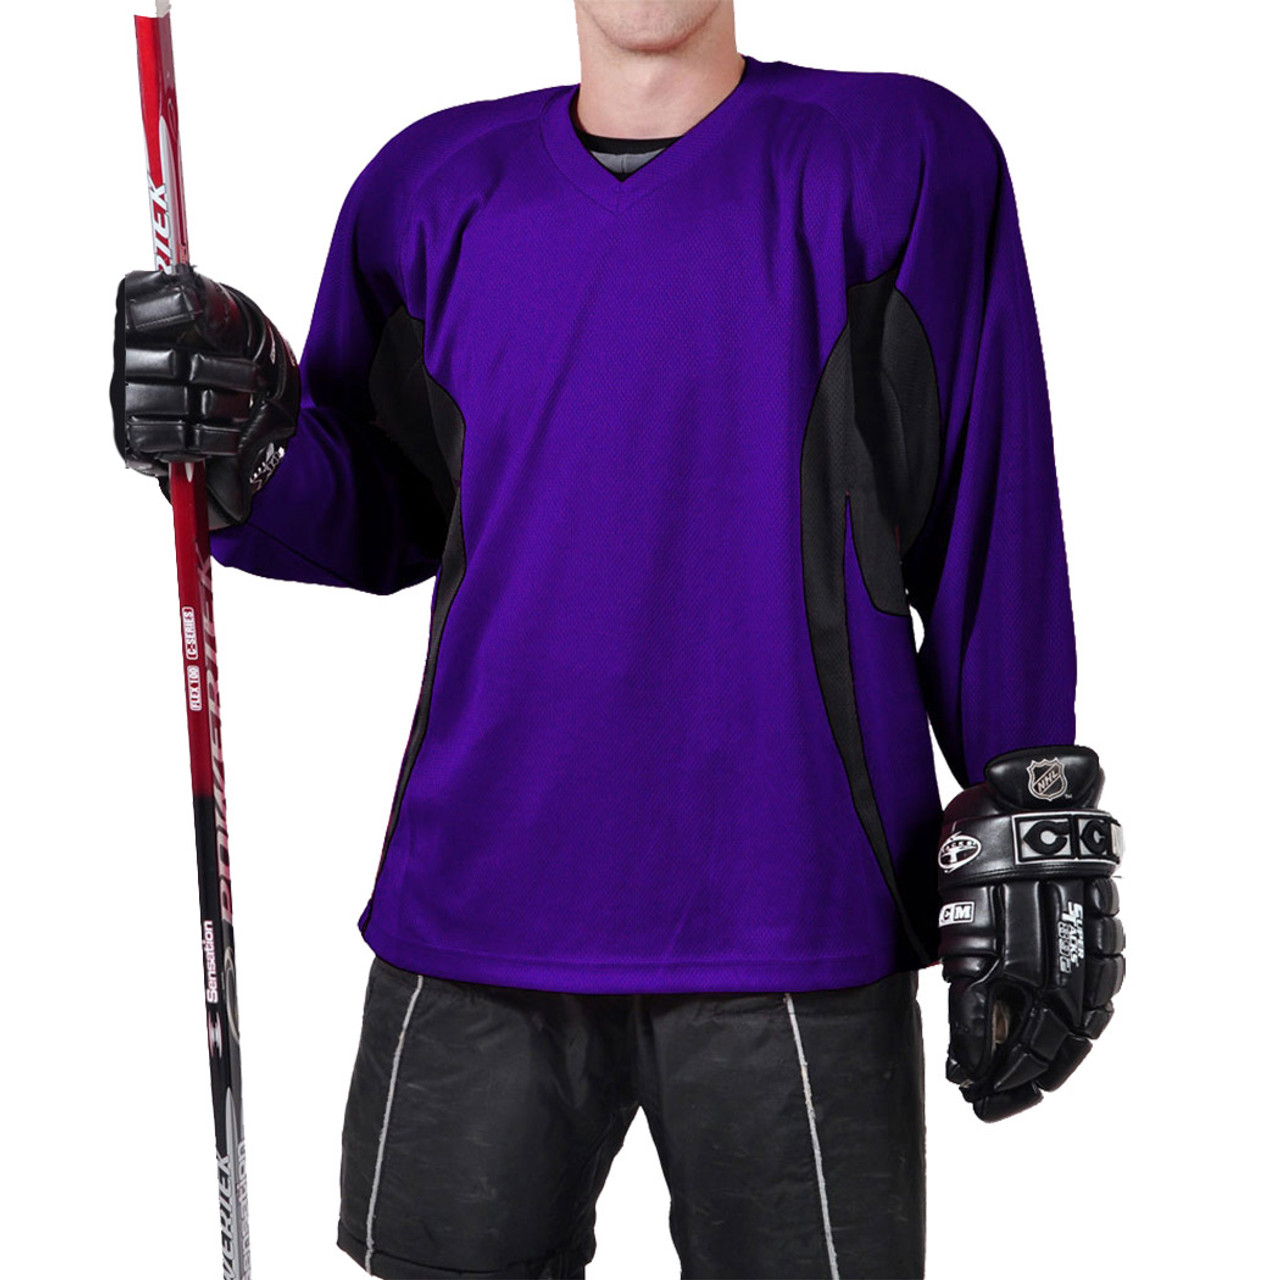 Firstar Rink Flow Hockey Jersey Gold